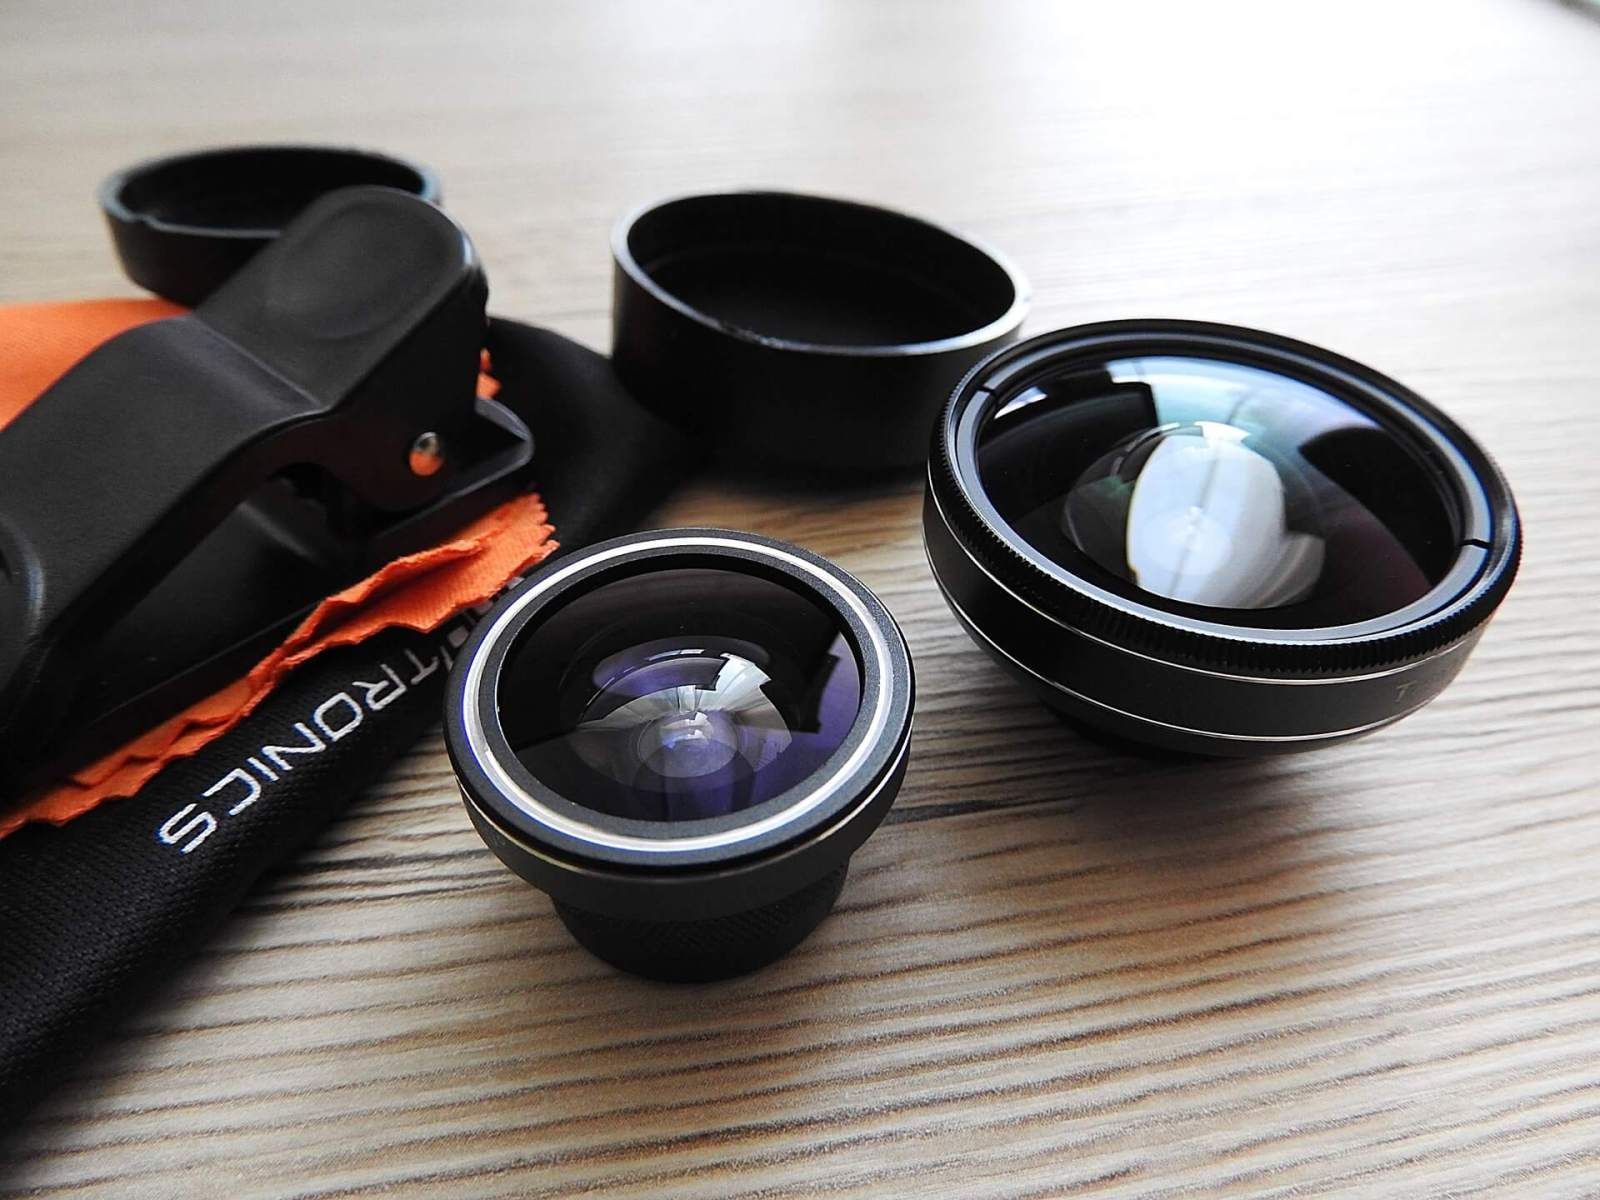 Best Mobile Camera Lenses for Smartphones